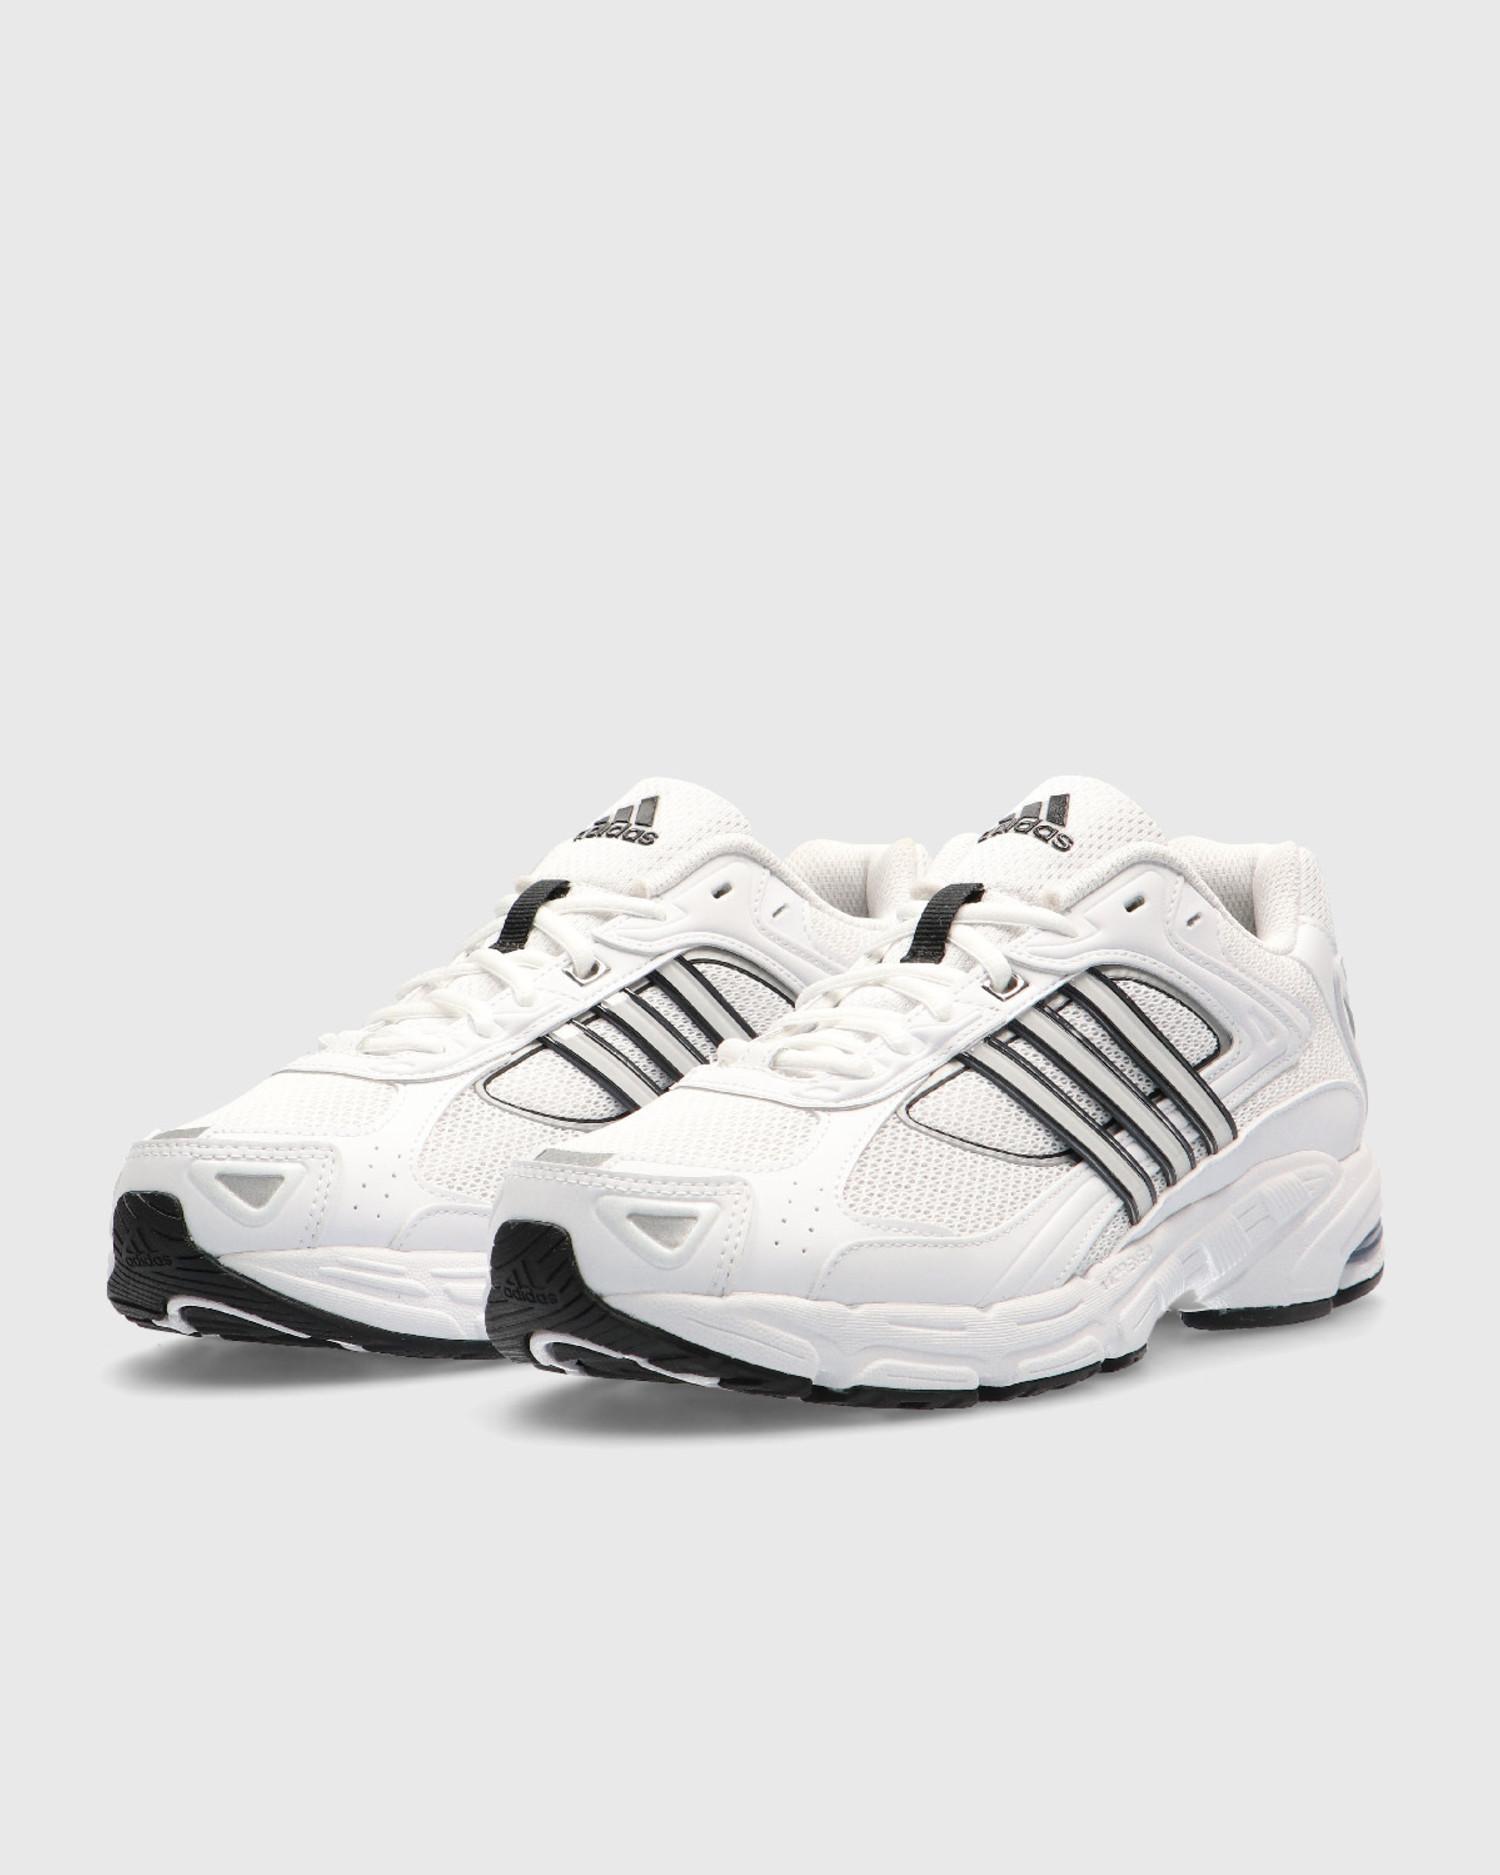 Adidas Response CL Ftwwht/Cblack/Ftwwht